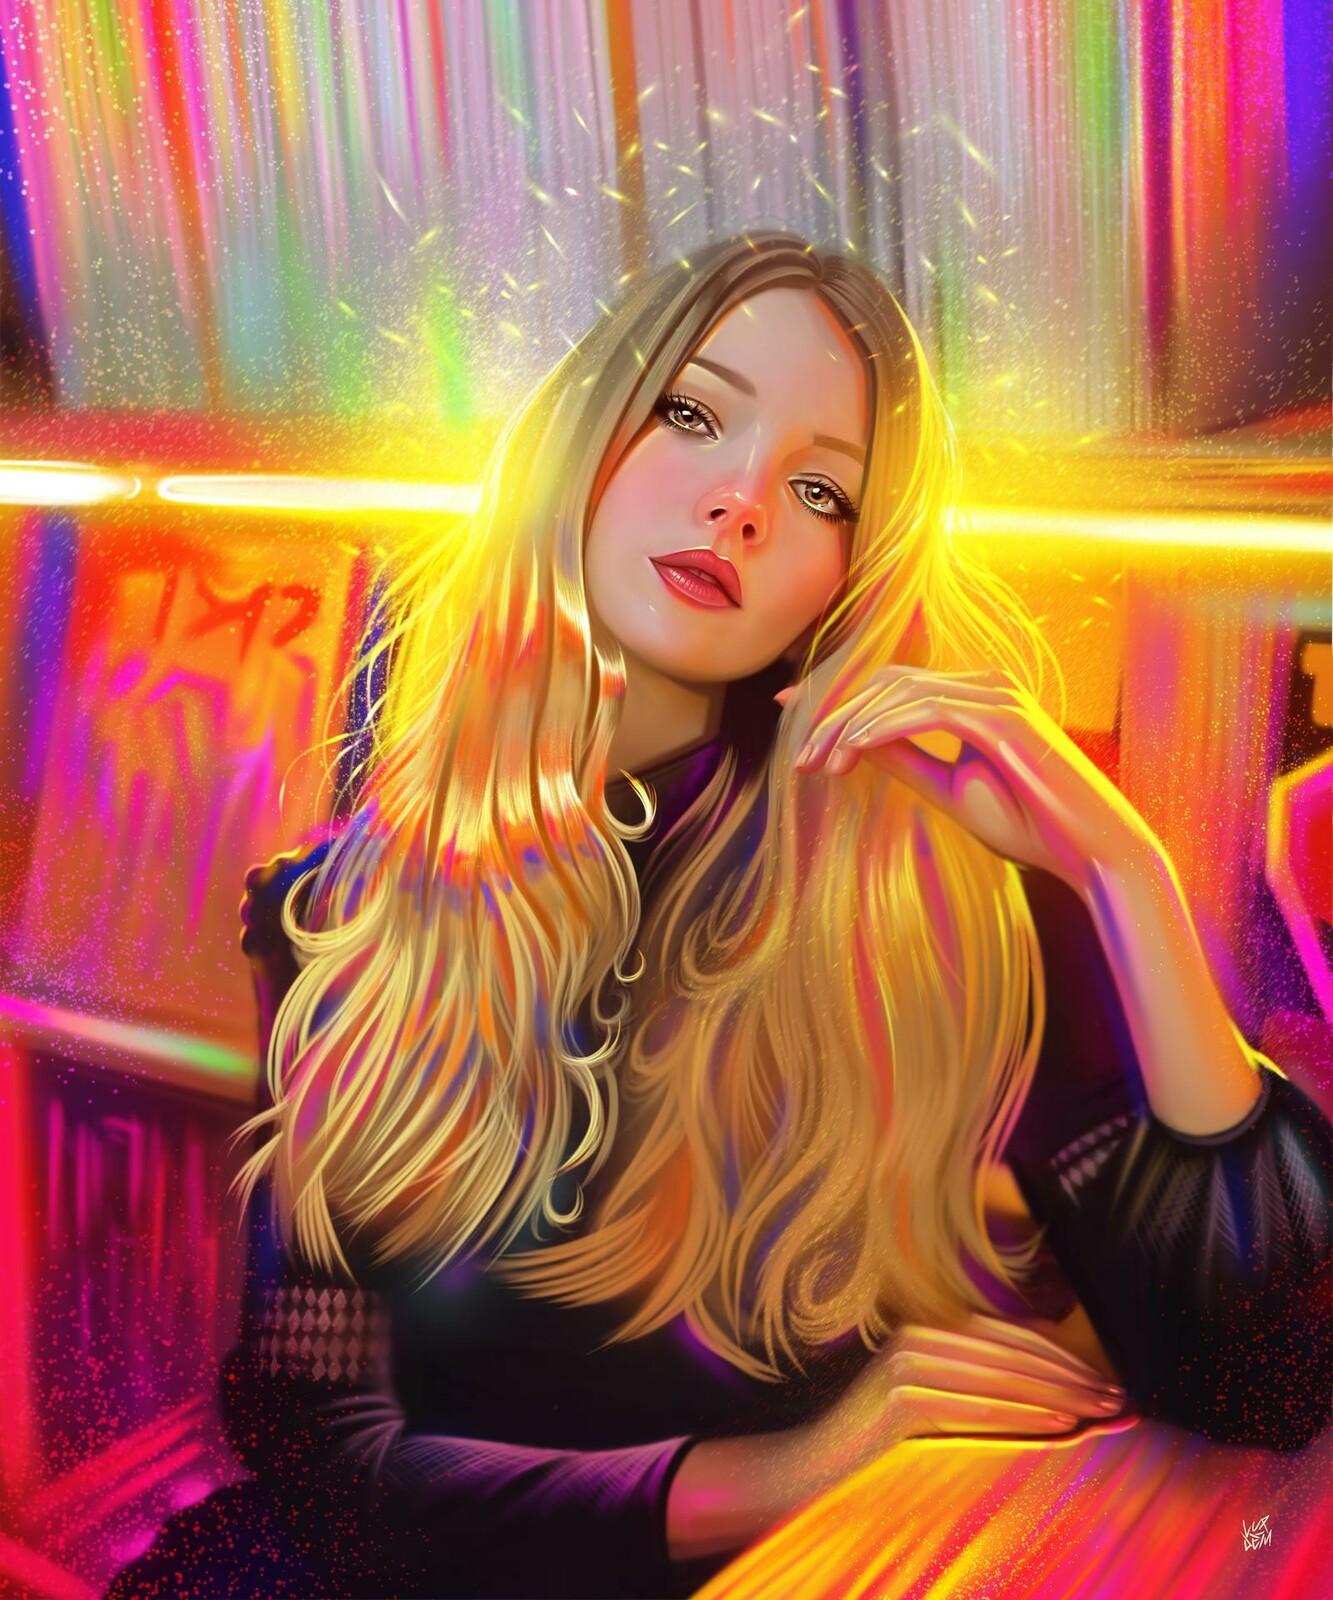 My Portrait Brush Set: https://www.artstation.com/vurdem/store/YxPB/portrait-brush-set-for-photoshop